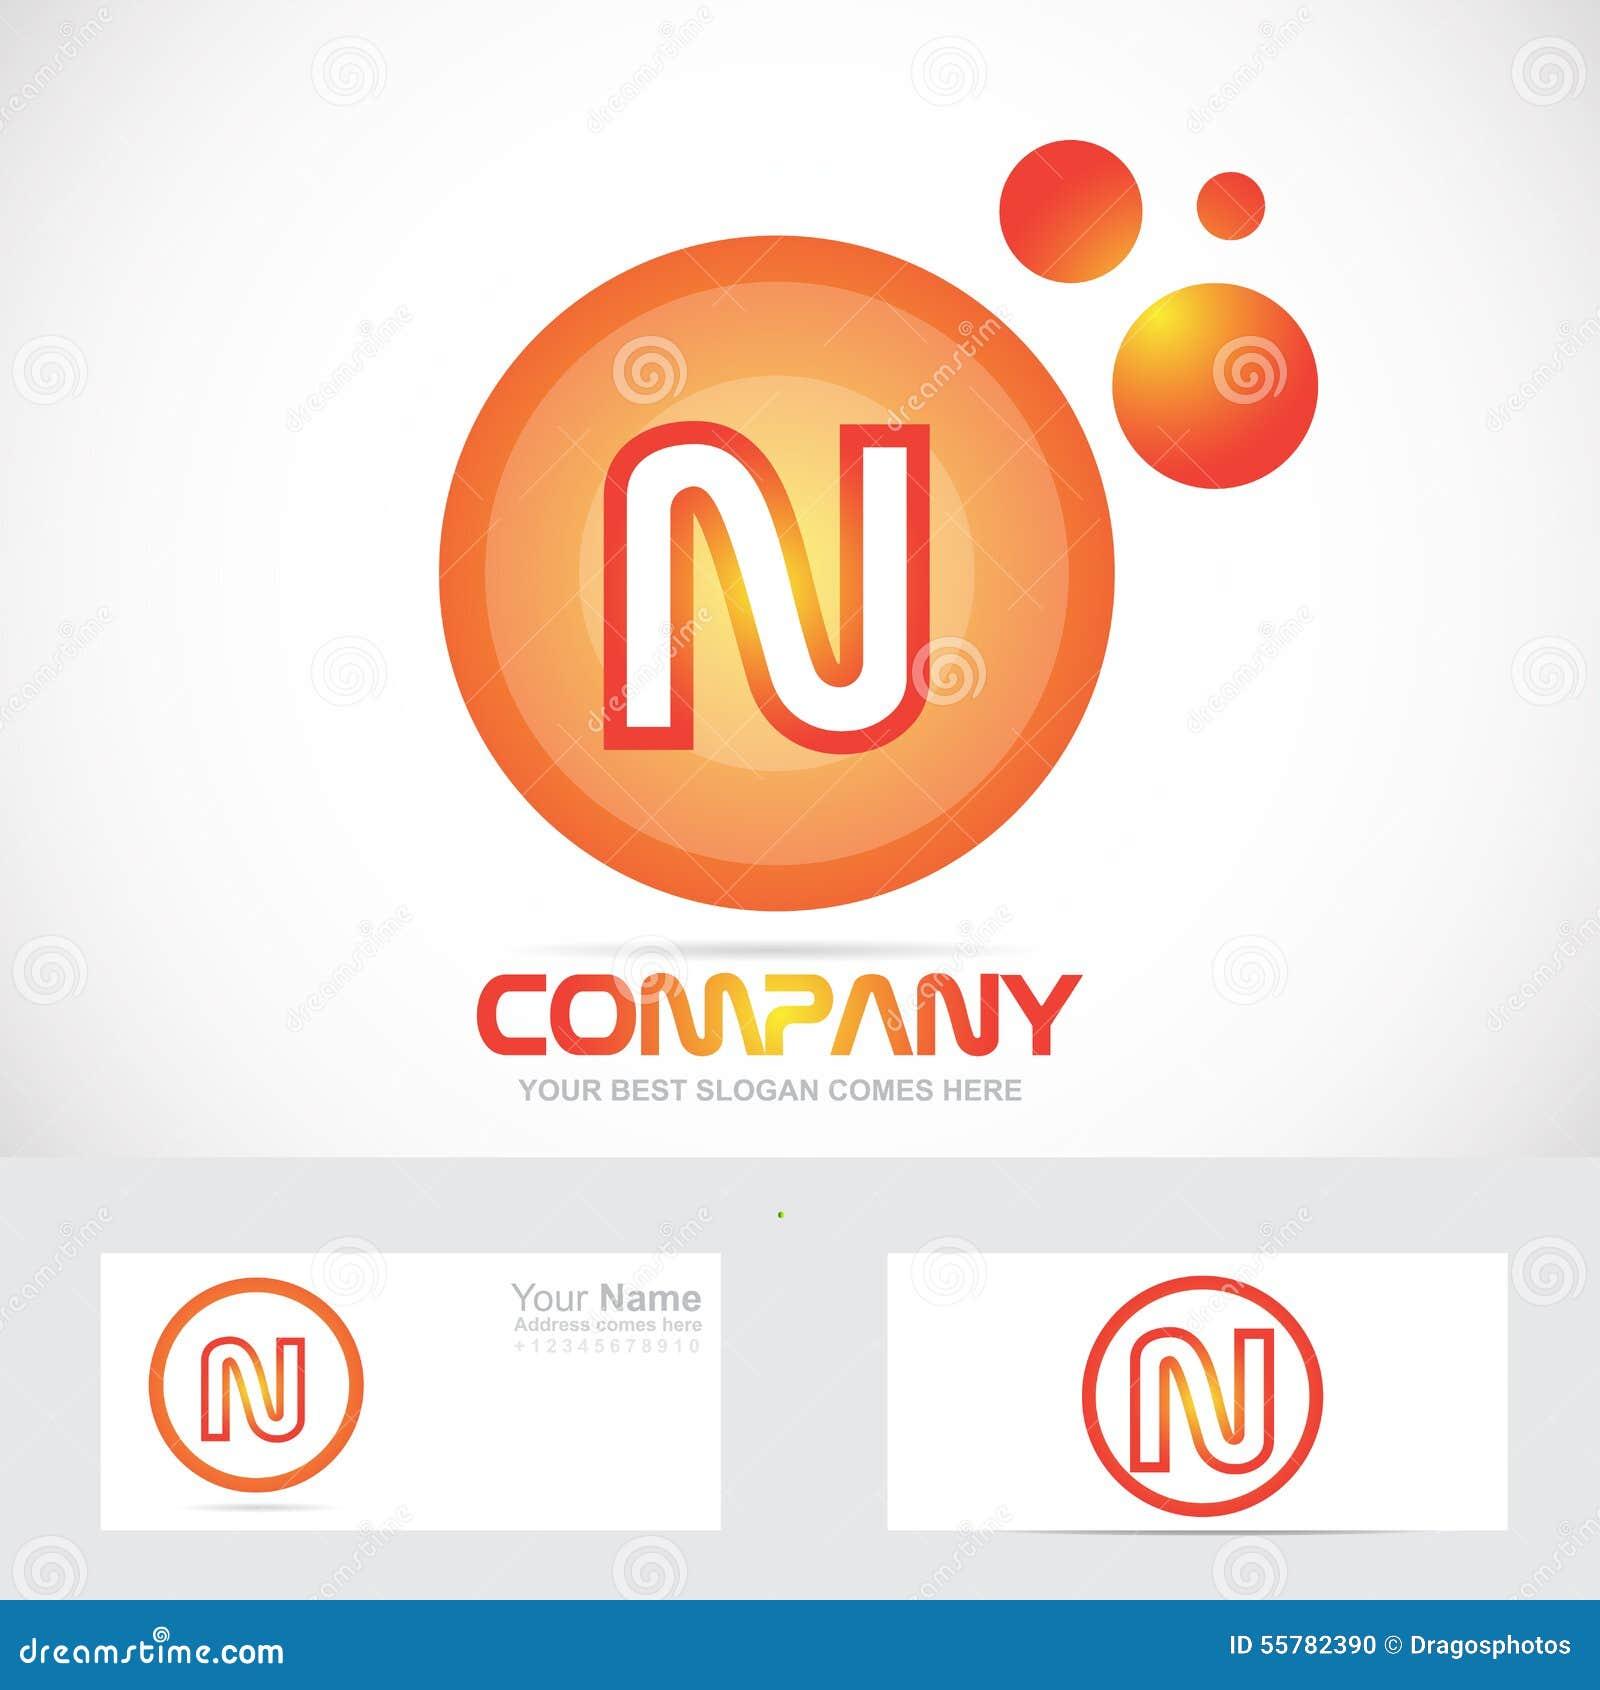 orange circle letter n bubble logo icon